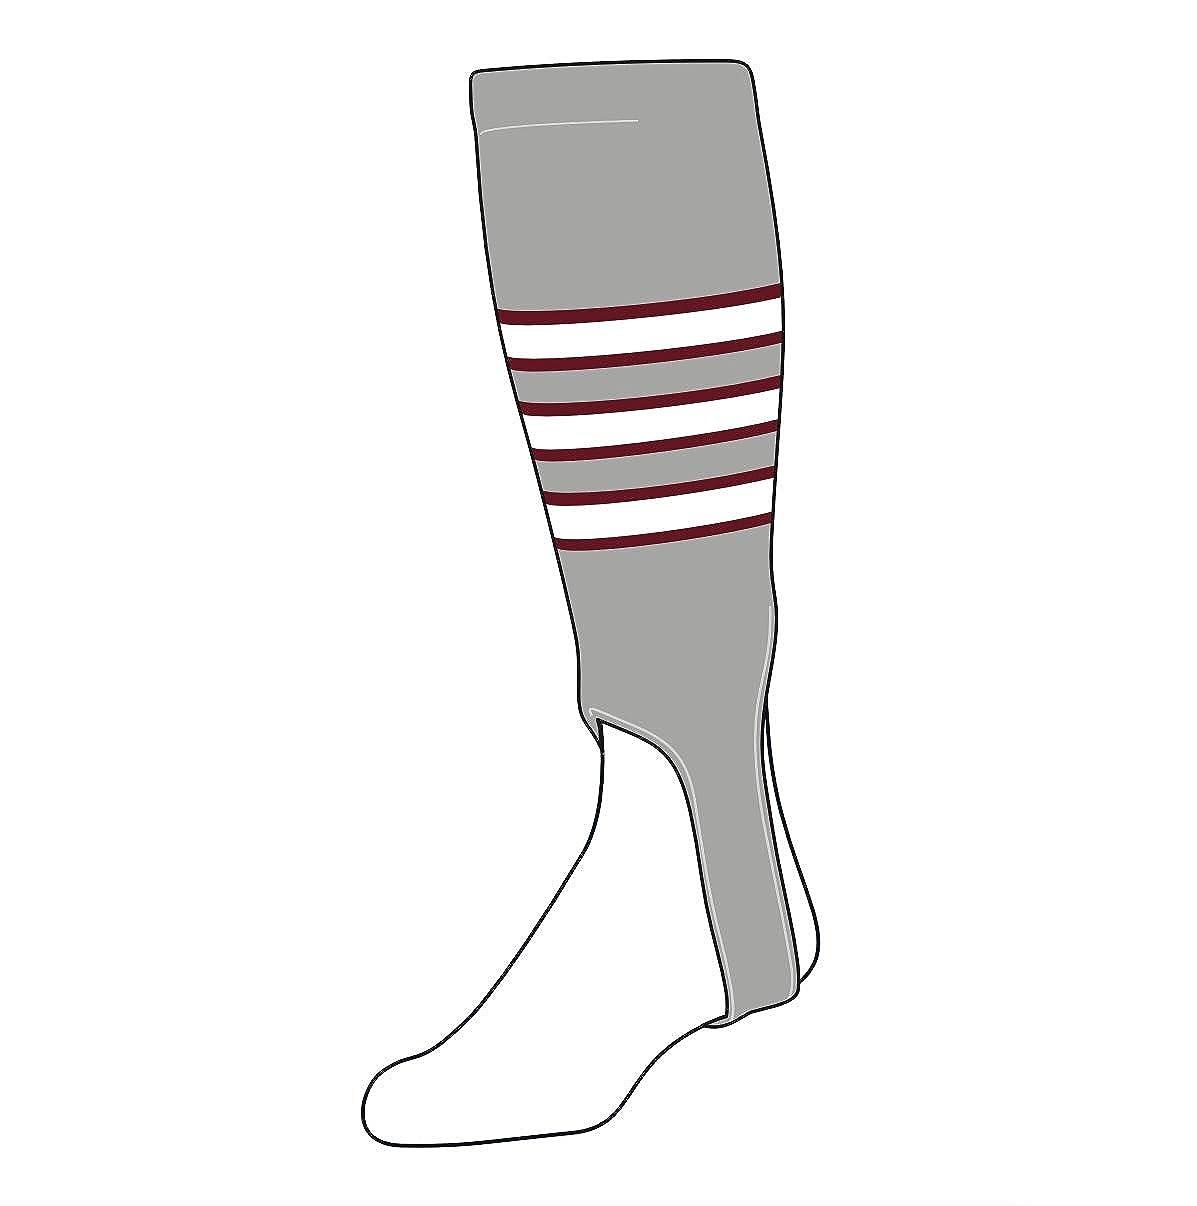 TCK Socks サイズ: SOCKSHOSIERY メンズ B07MVM49XW US サイズ: Large Large 19 inch (16+ years) B07MVM49XW, TAHITI MARCHE ータヒチマルシェー:c7067619 --- cgt-tbc.fr